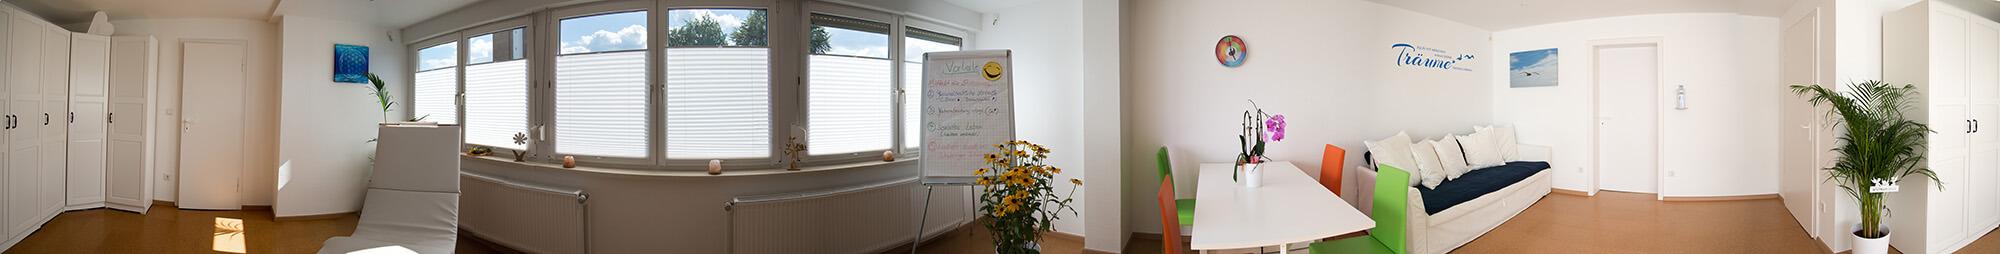 Gesundheitsmagnet - Naturheilpraxis Martina Altenhövel Behandlungsraum